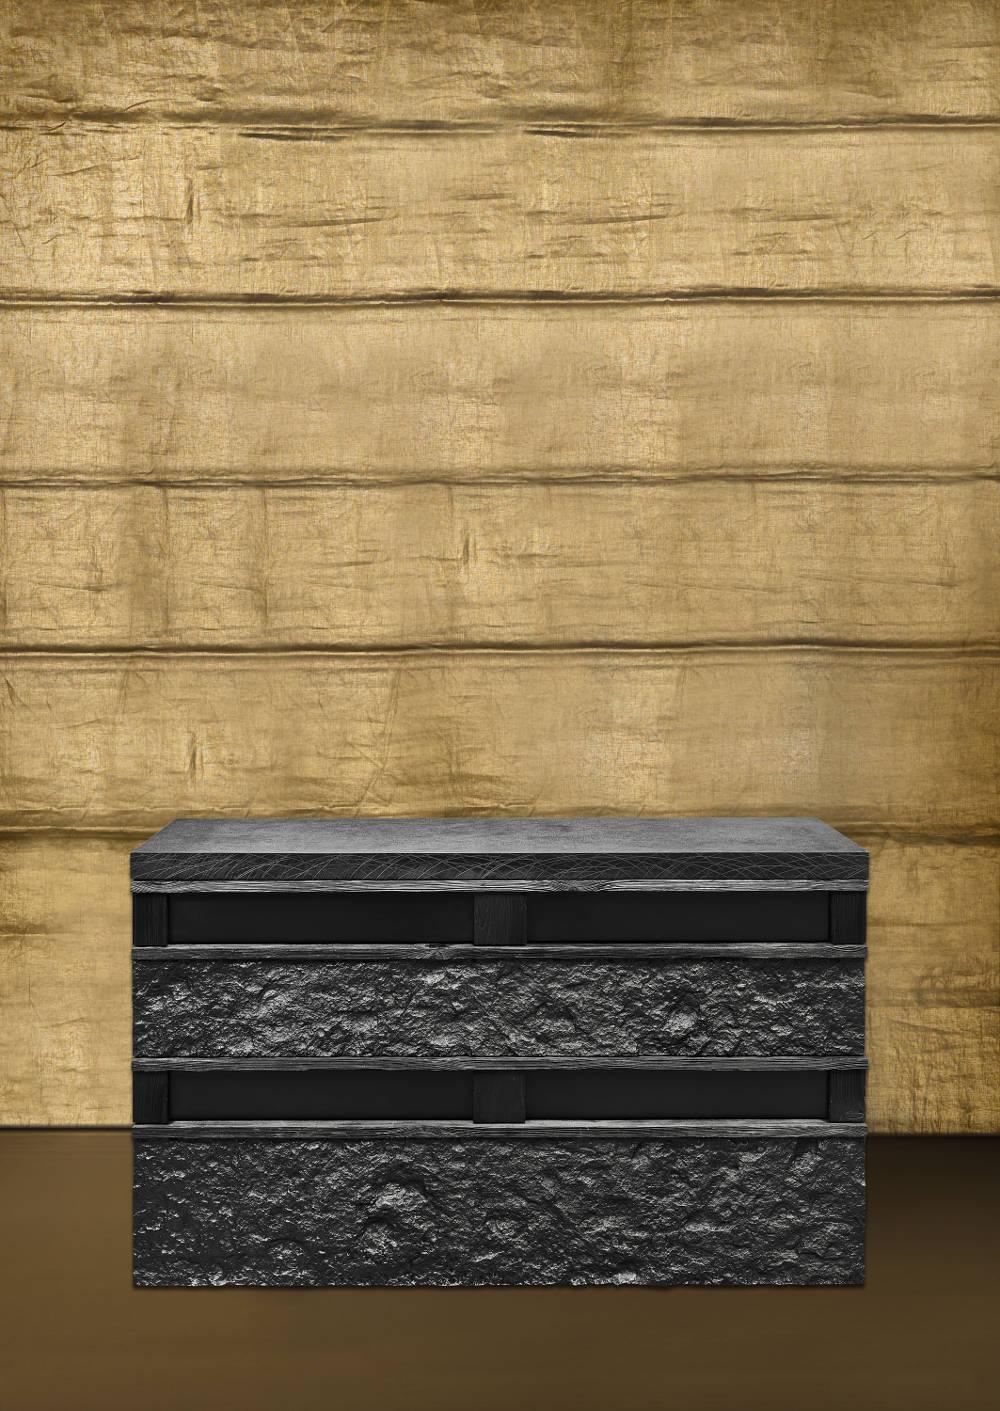 Peter Marino, Rough Stone Box, 2017. Blackened bronze 33 1/8 × 50 3/8 × 20 7/8 inches (84.2 × 128 × 53 cm) © Peter Marino Architect. Photo by Manolo Yllera. Courtesy Peter Marino Architect and Gagosian.